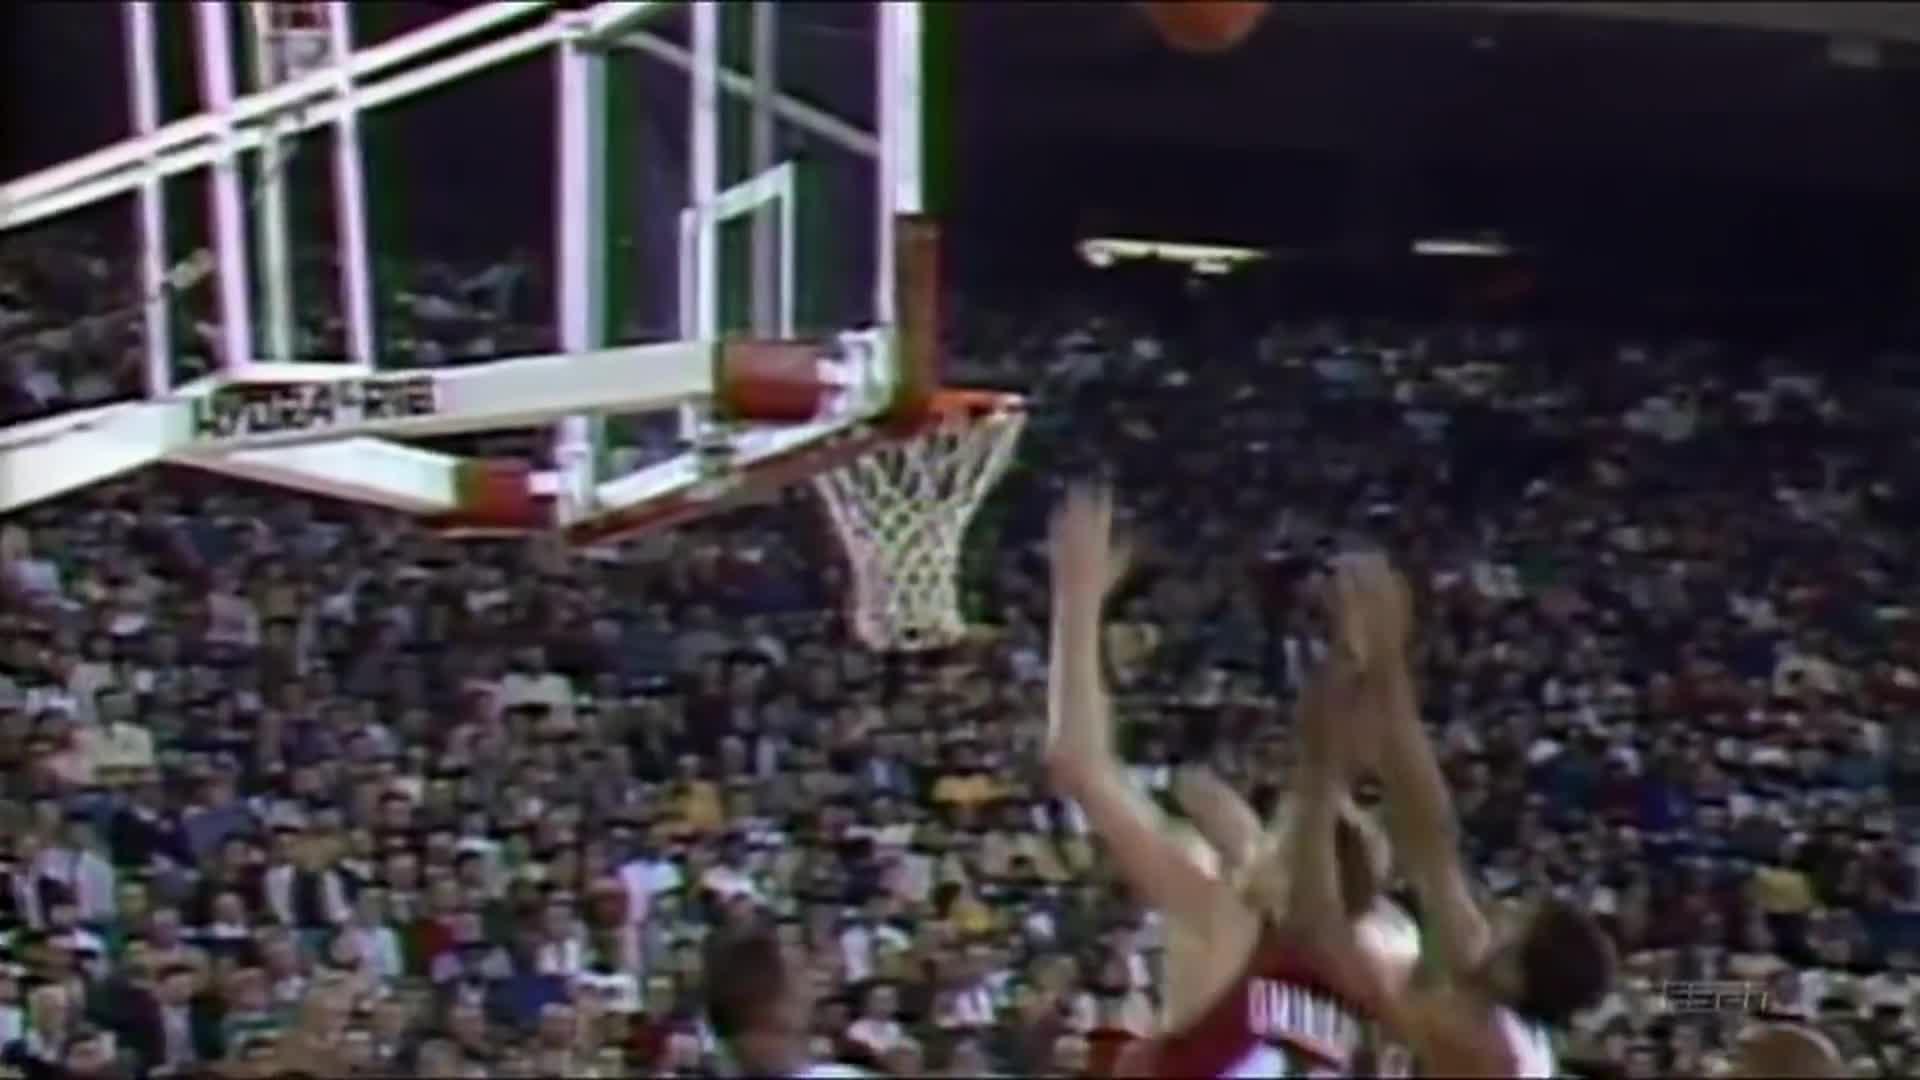 basketball (interest), charles barkley (basketball player), dennis rodman (basketball player), people & blogs, safa doyran, 2 GOAT rebounders battle it out. GIFs